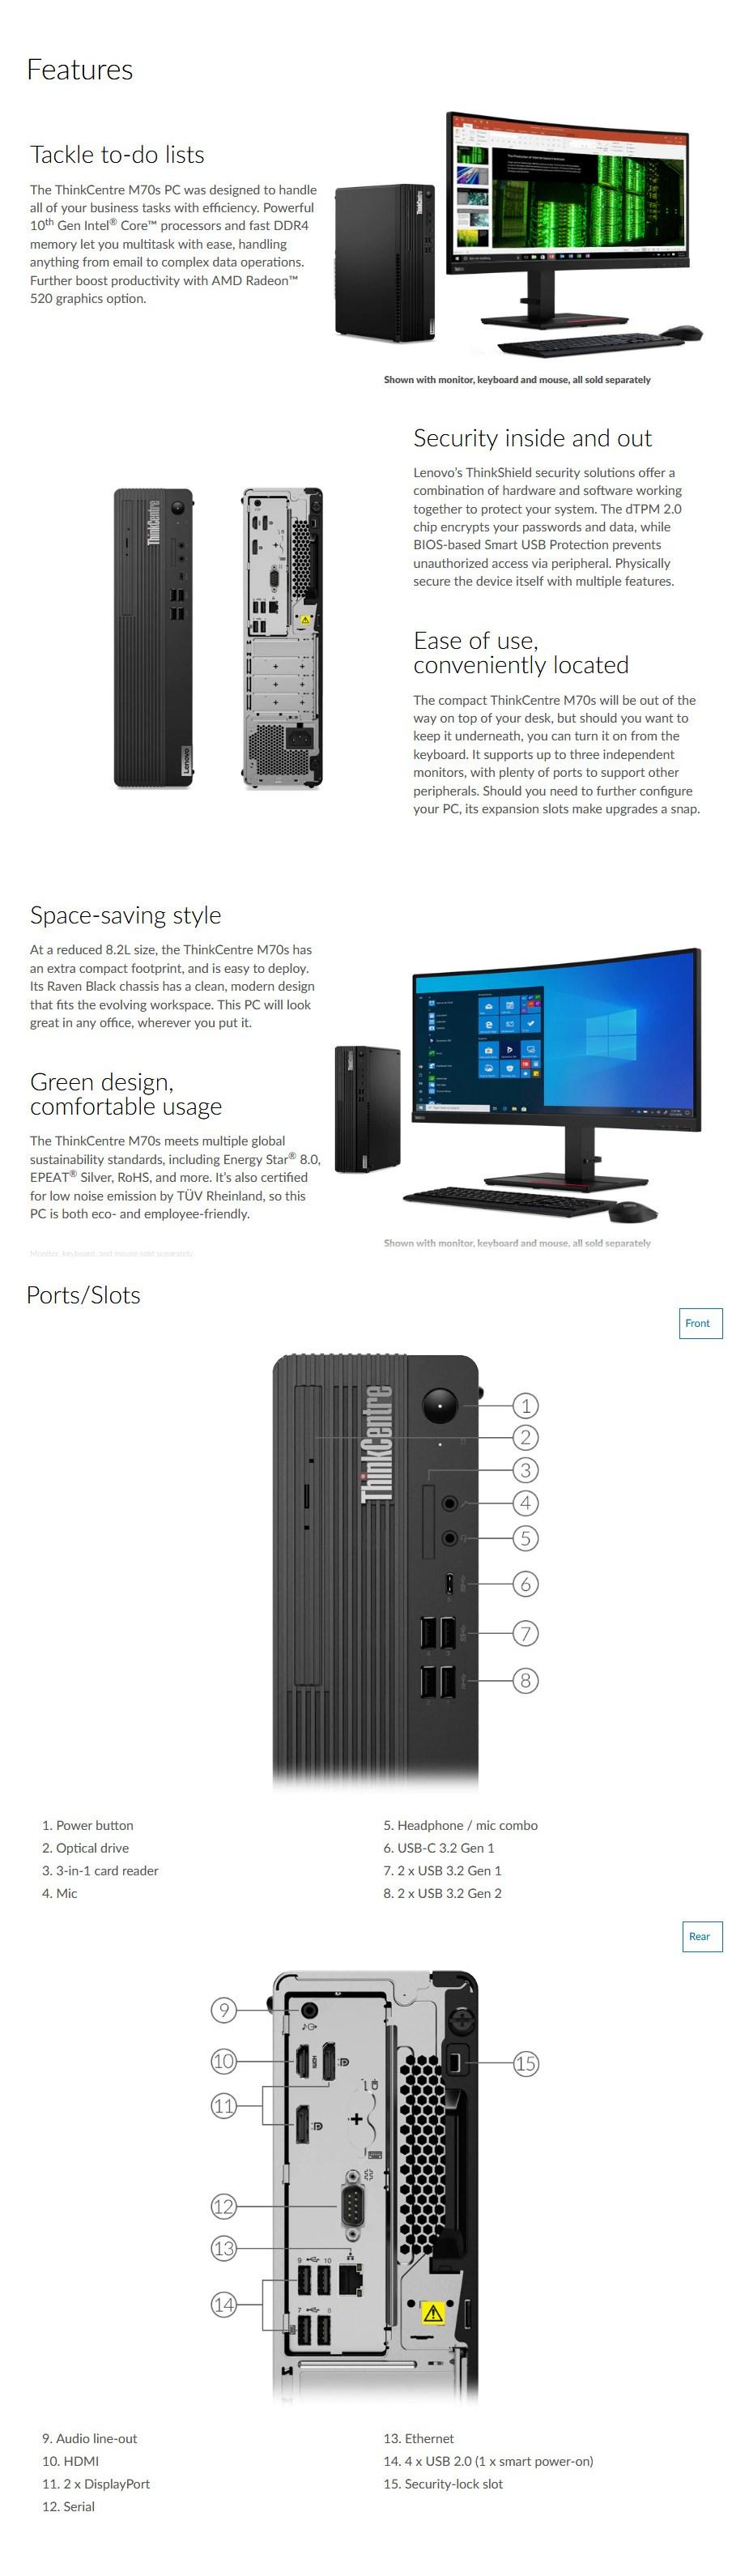 Lenovo M70S SFF Desktop i5-10400 8GB 256GB Windows 10 Pro - Overview 1